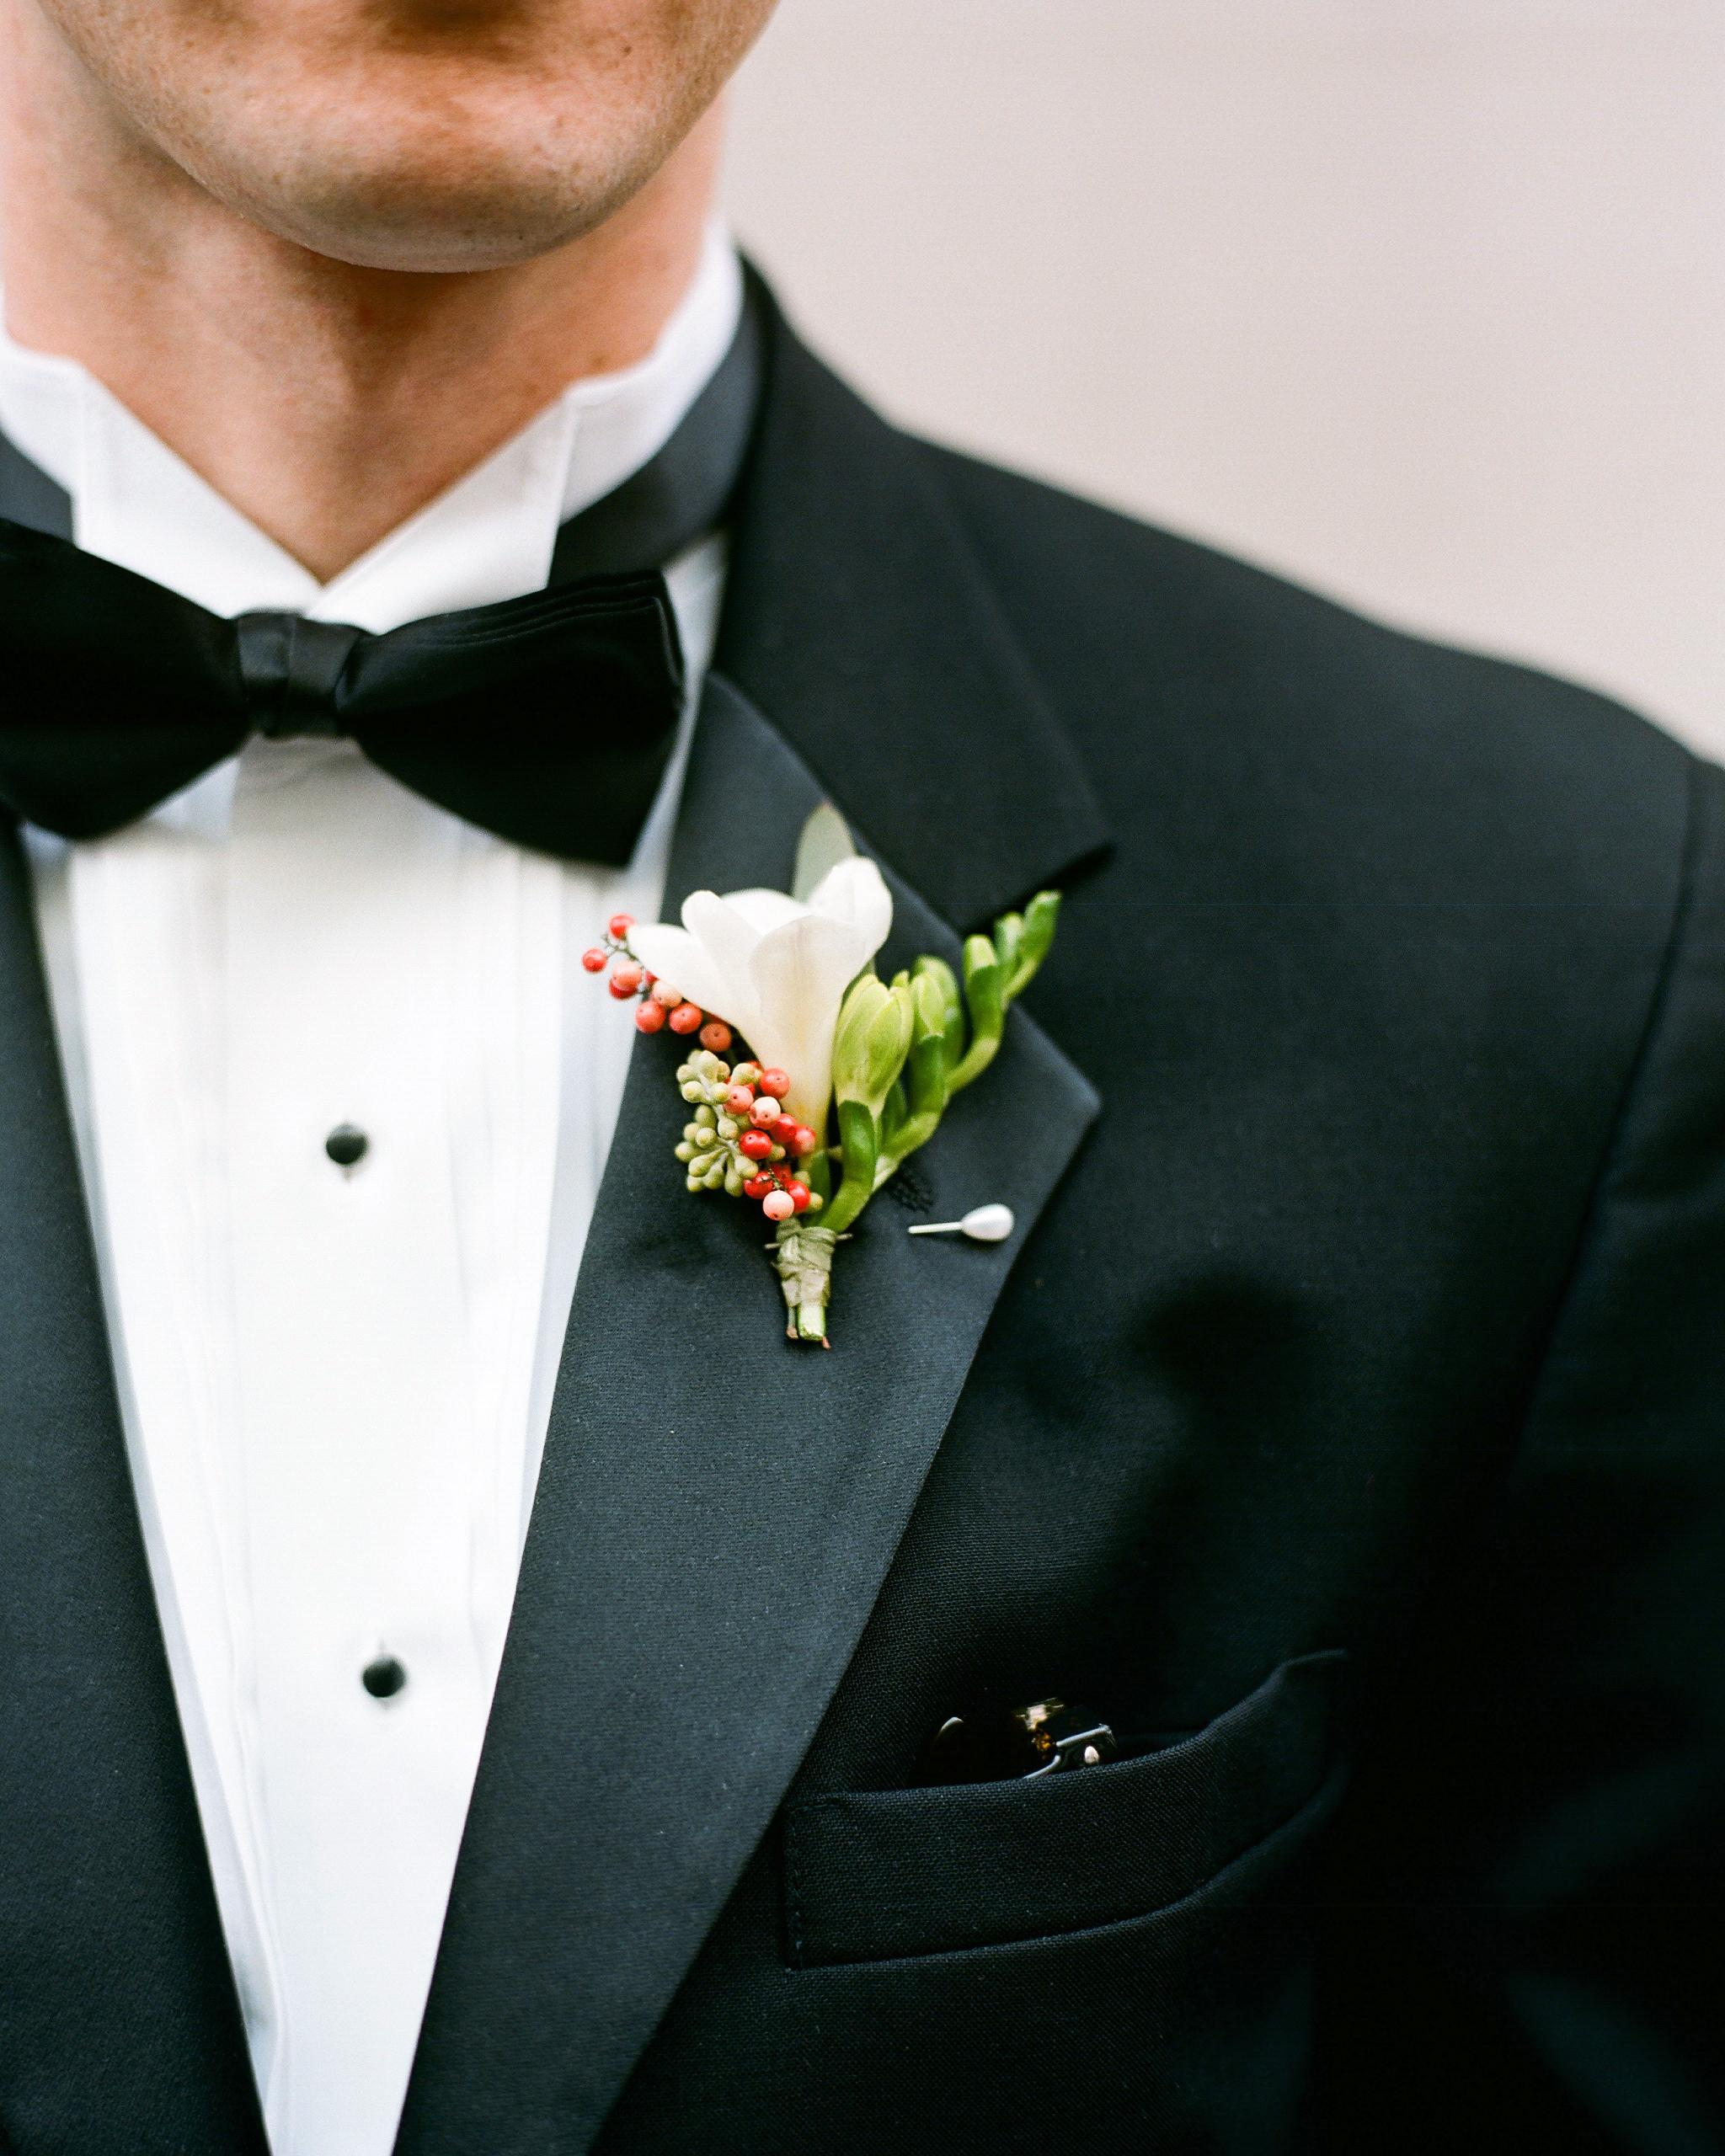 real-weddings-jess-greg-0811-072.jpg